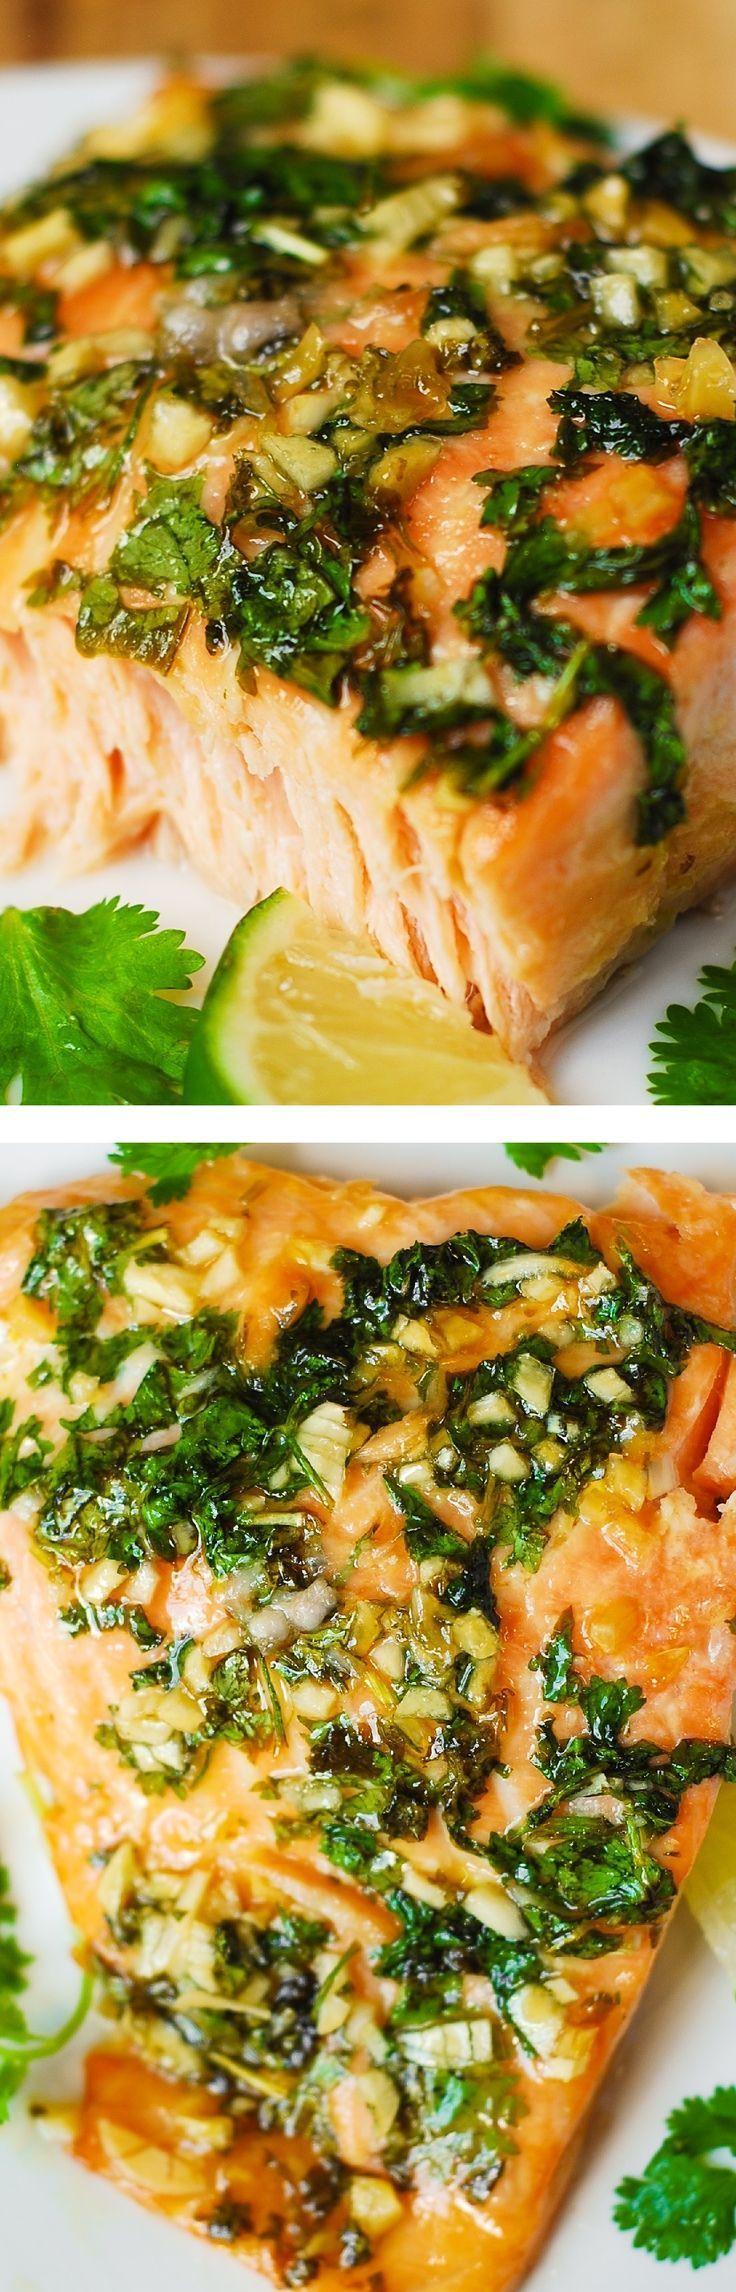 Cilantro-Lime Honey Garlic Salmon baked in foil – easy, healthy recipe that takes 30 minutes from start to finish! (Bake Shrimp Feta)